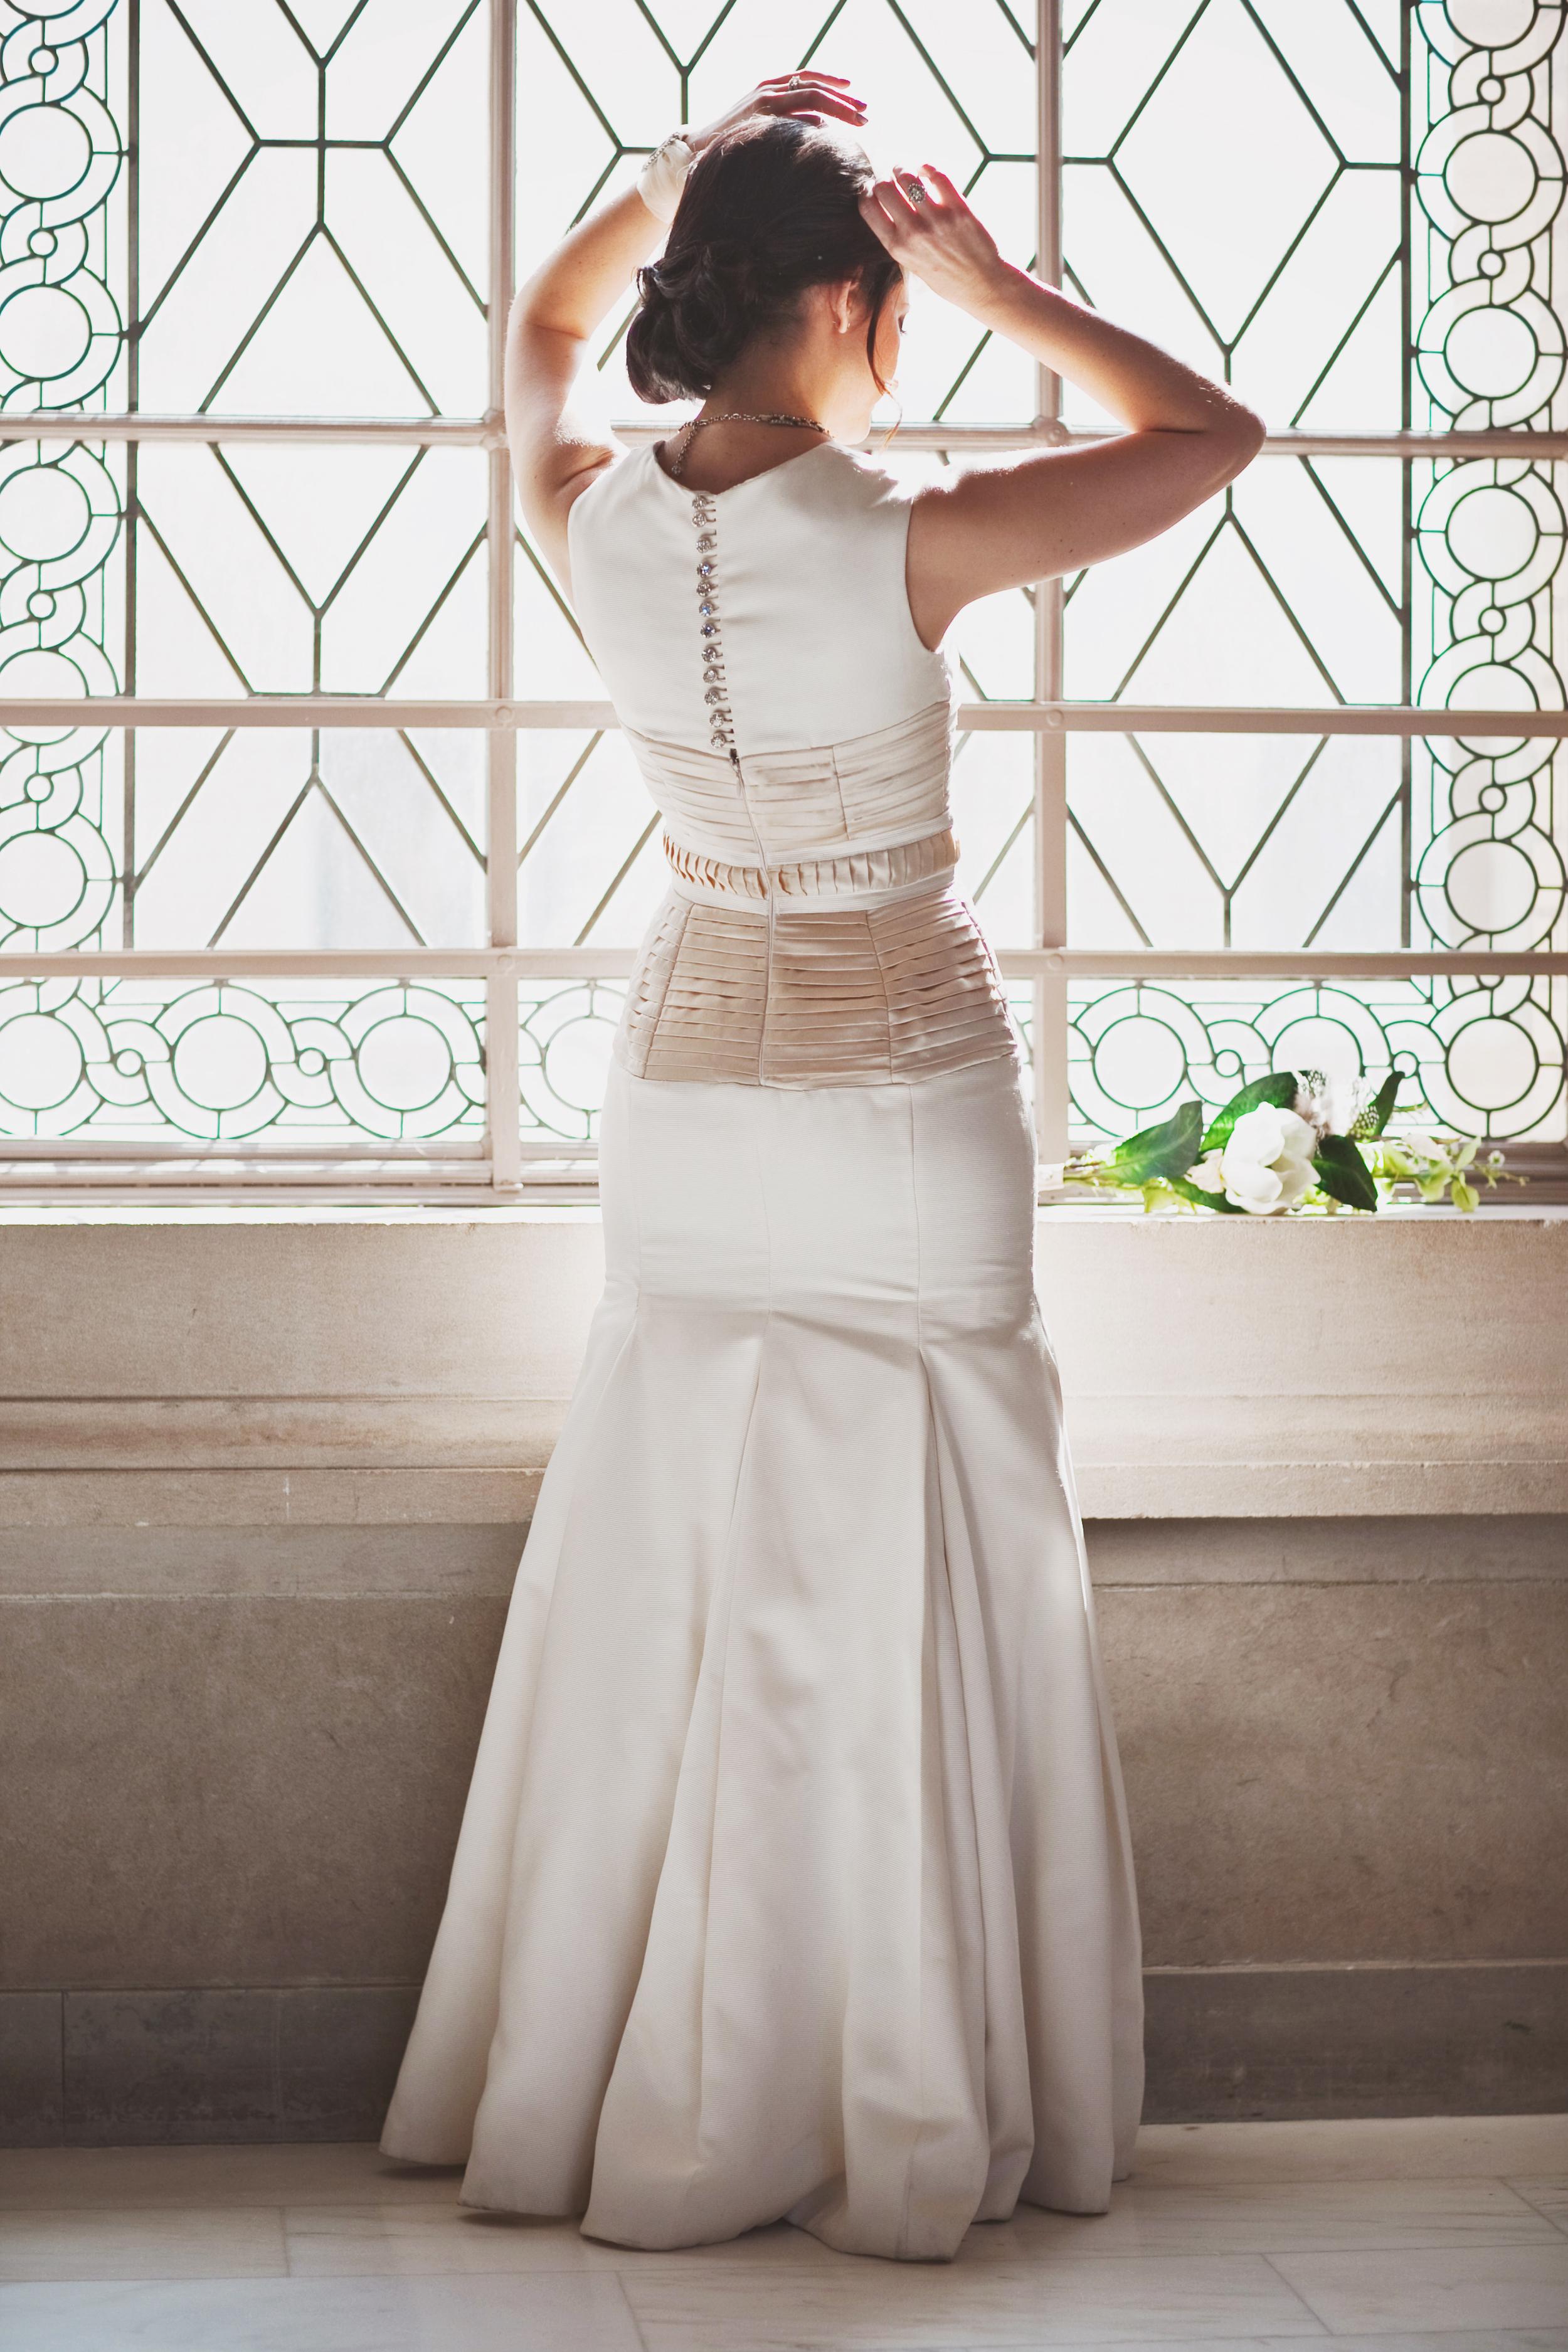 San_Francisco_City_Hall_Wedding_Photography_Cori_EB-13.JPG